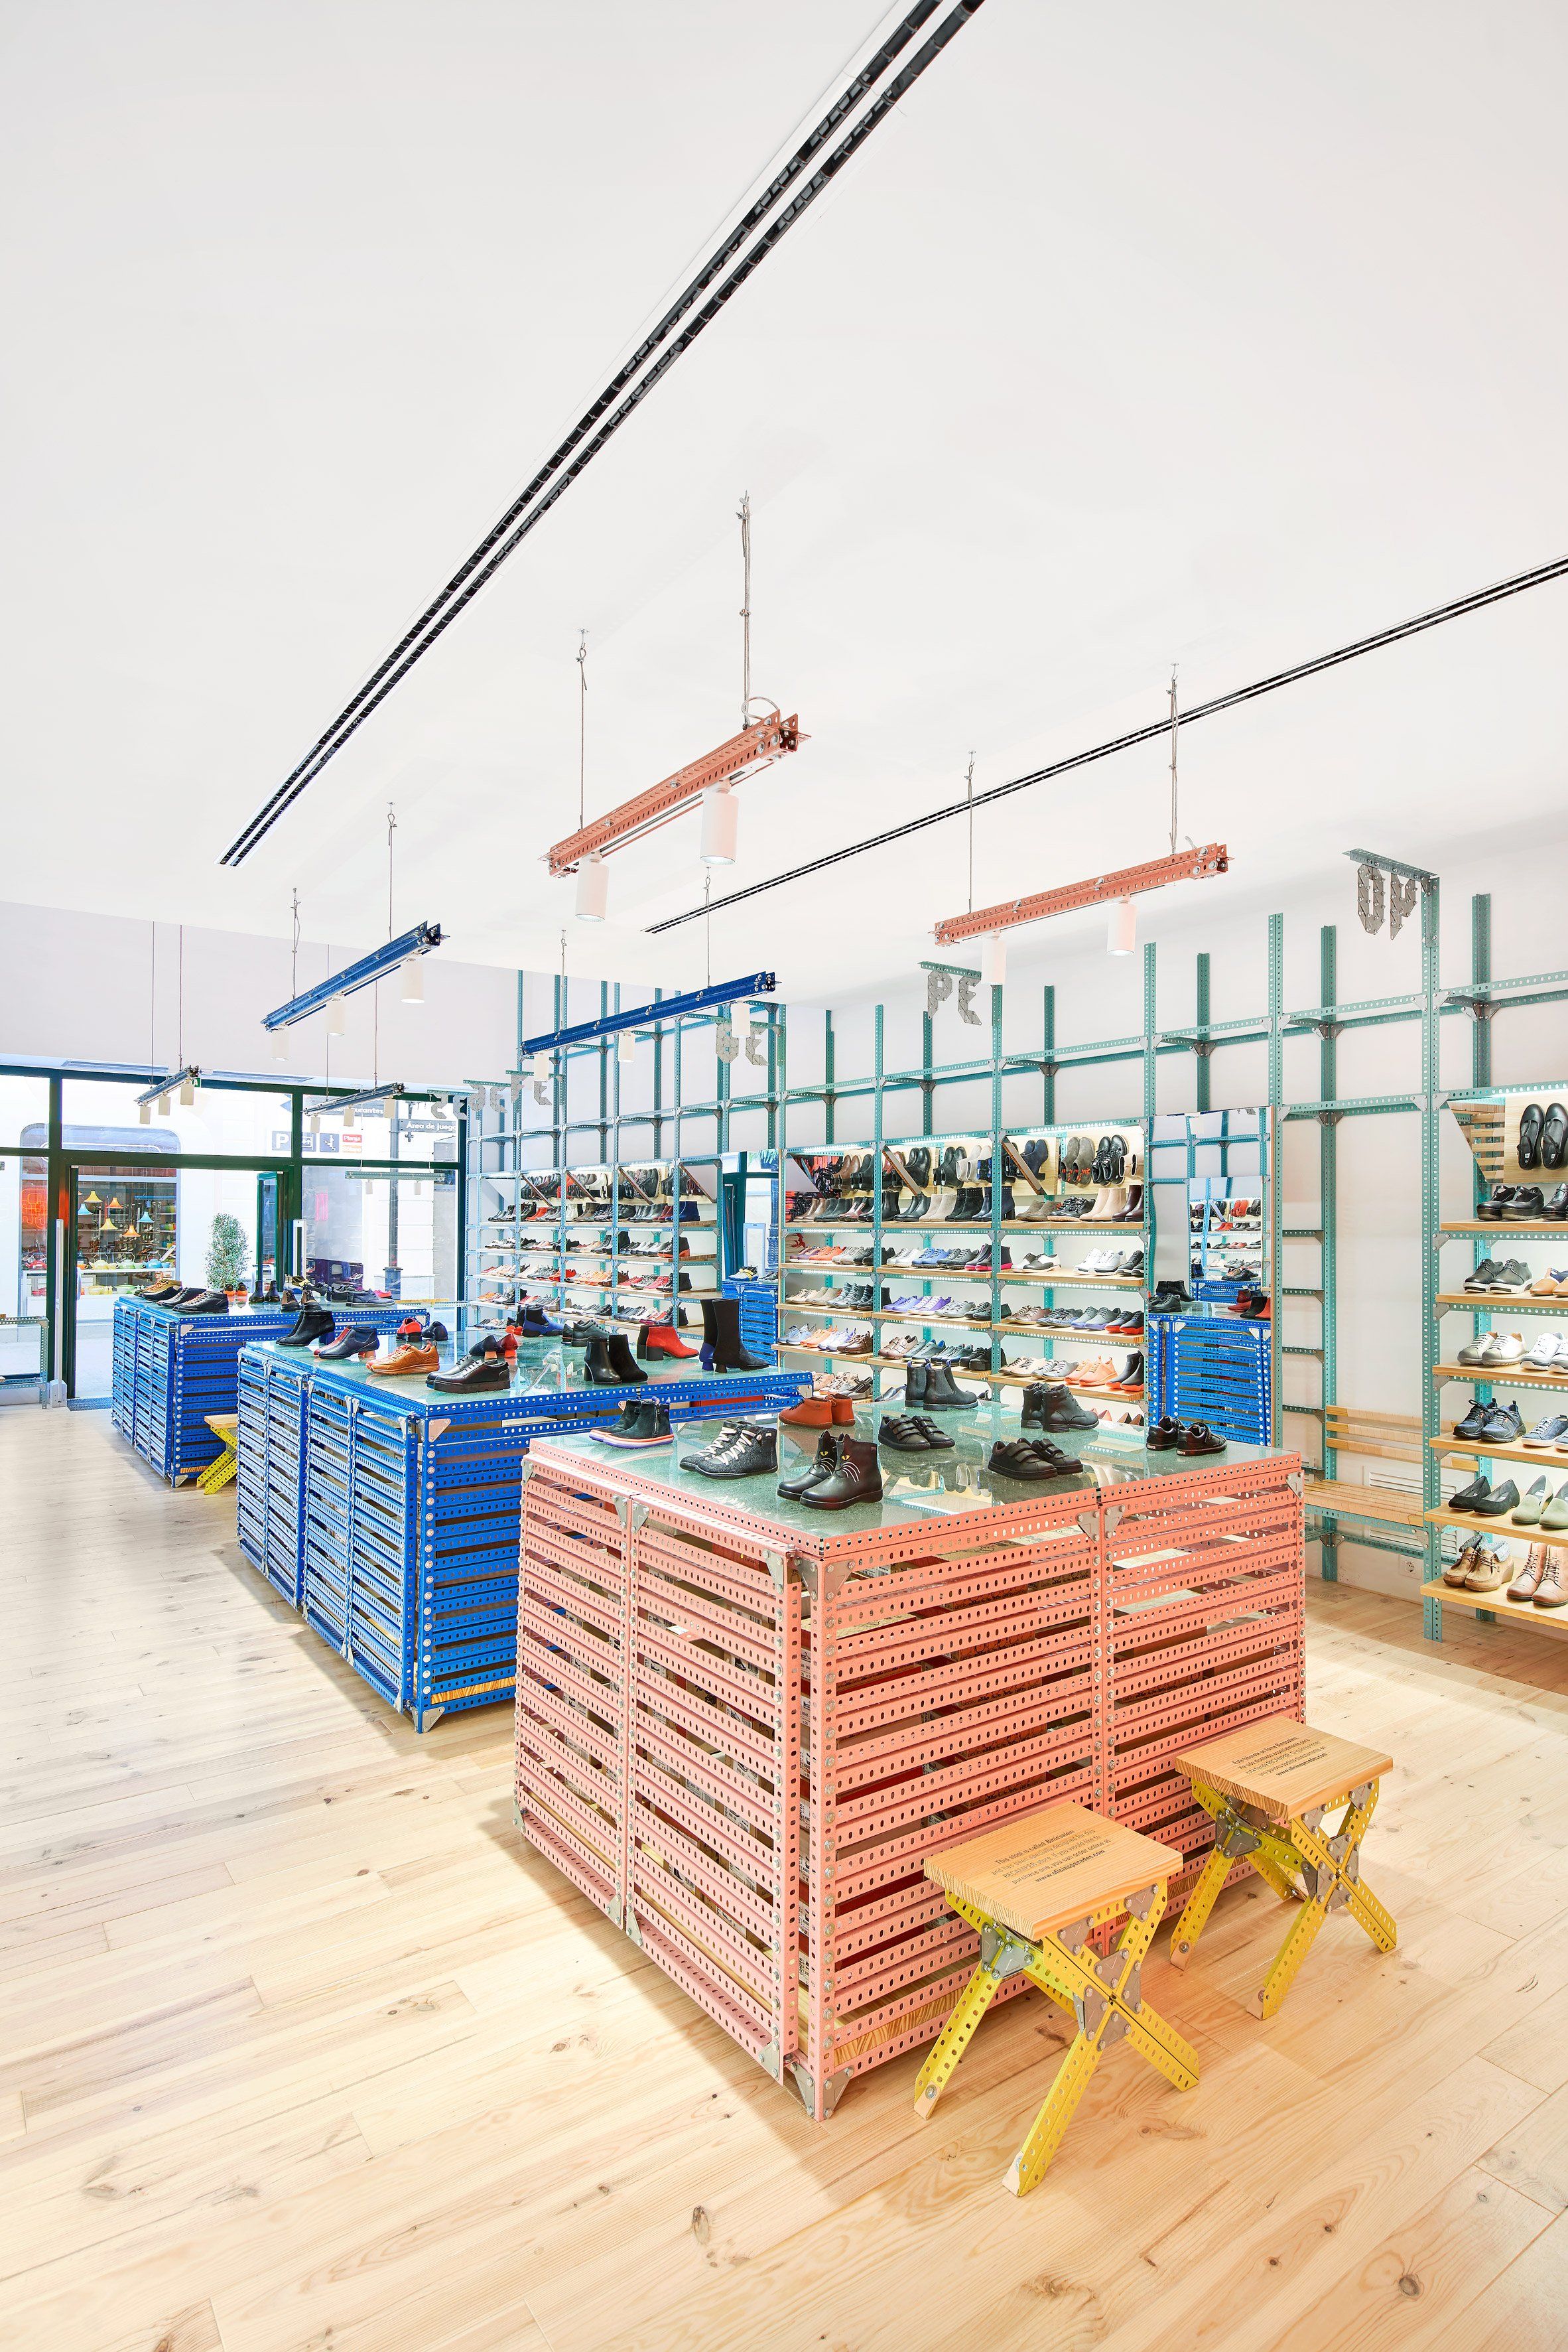 Camper store by Jorge Penades in Malaga